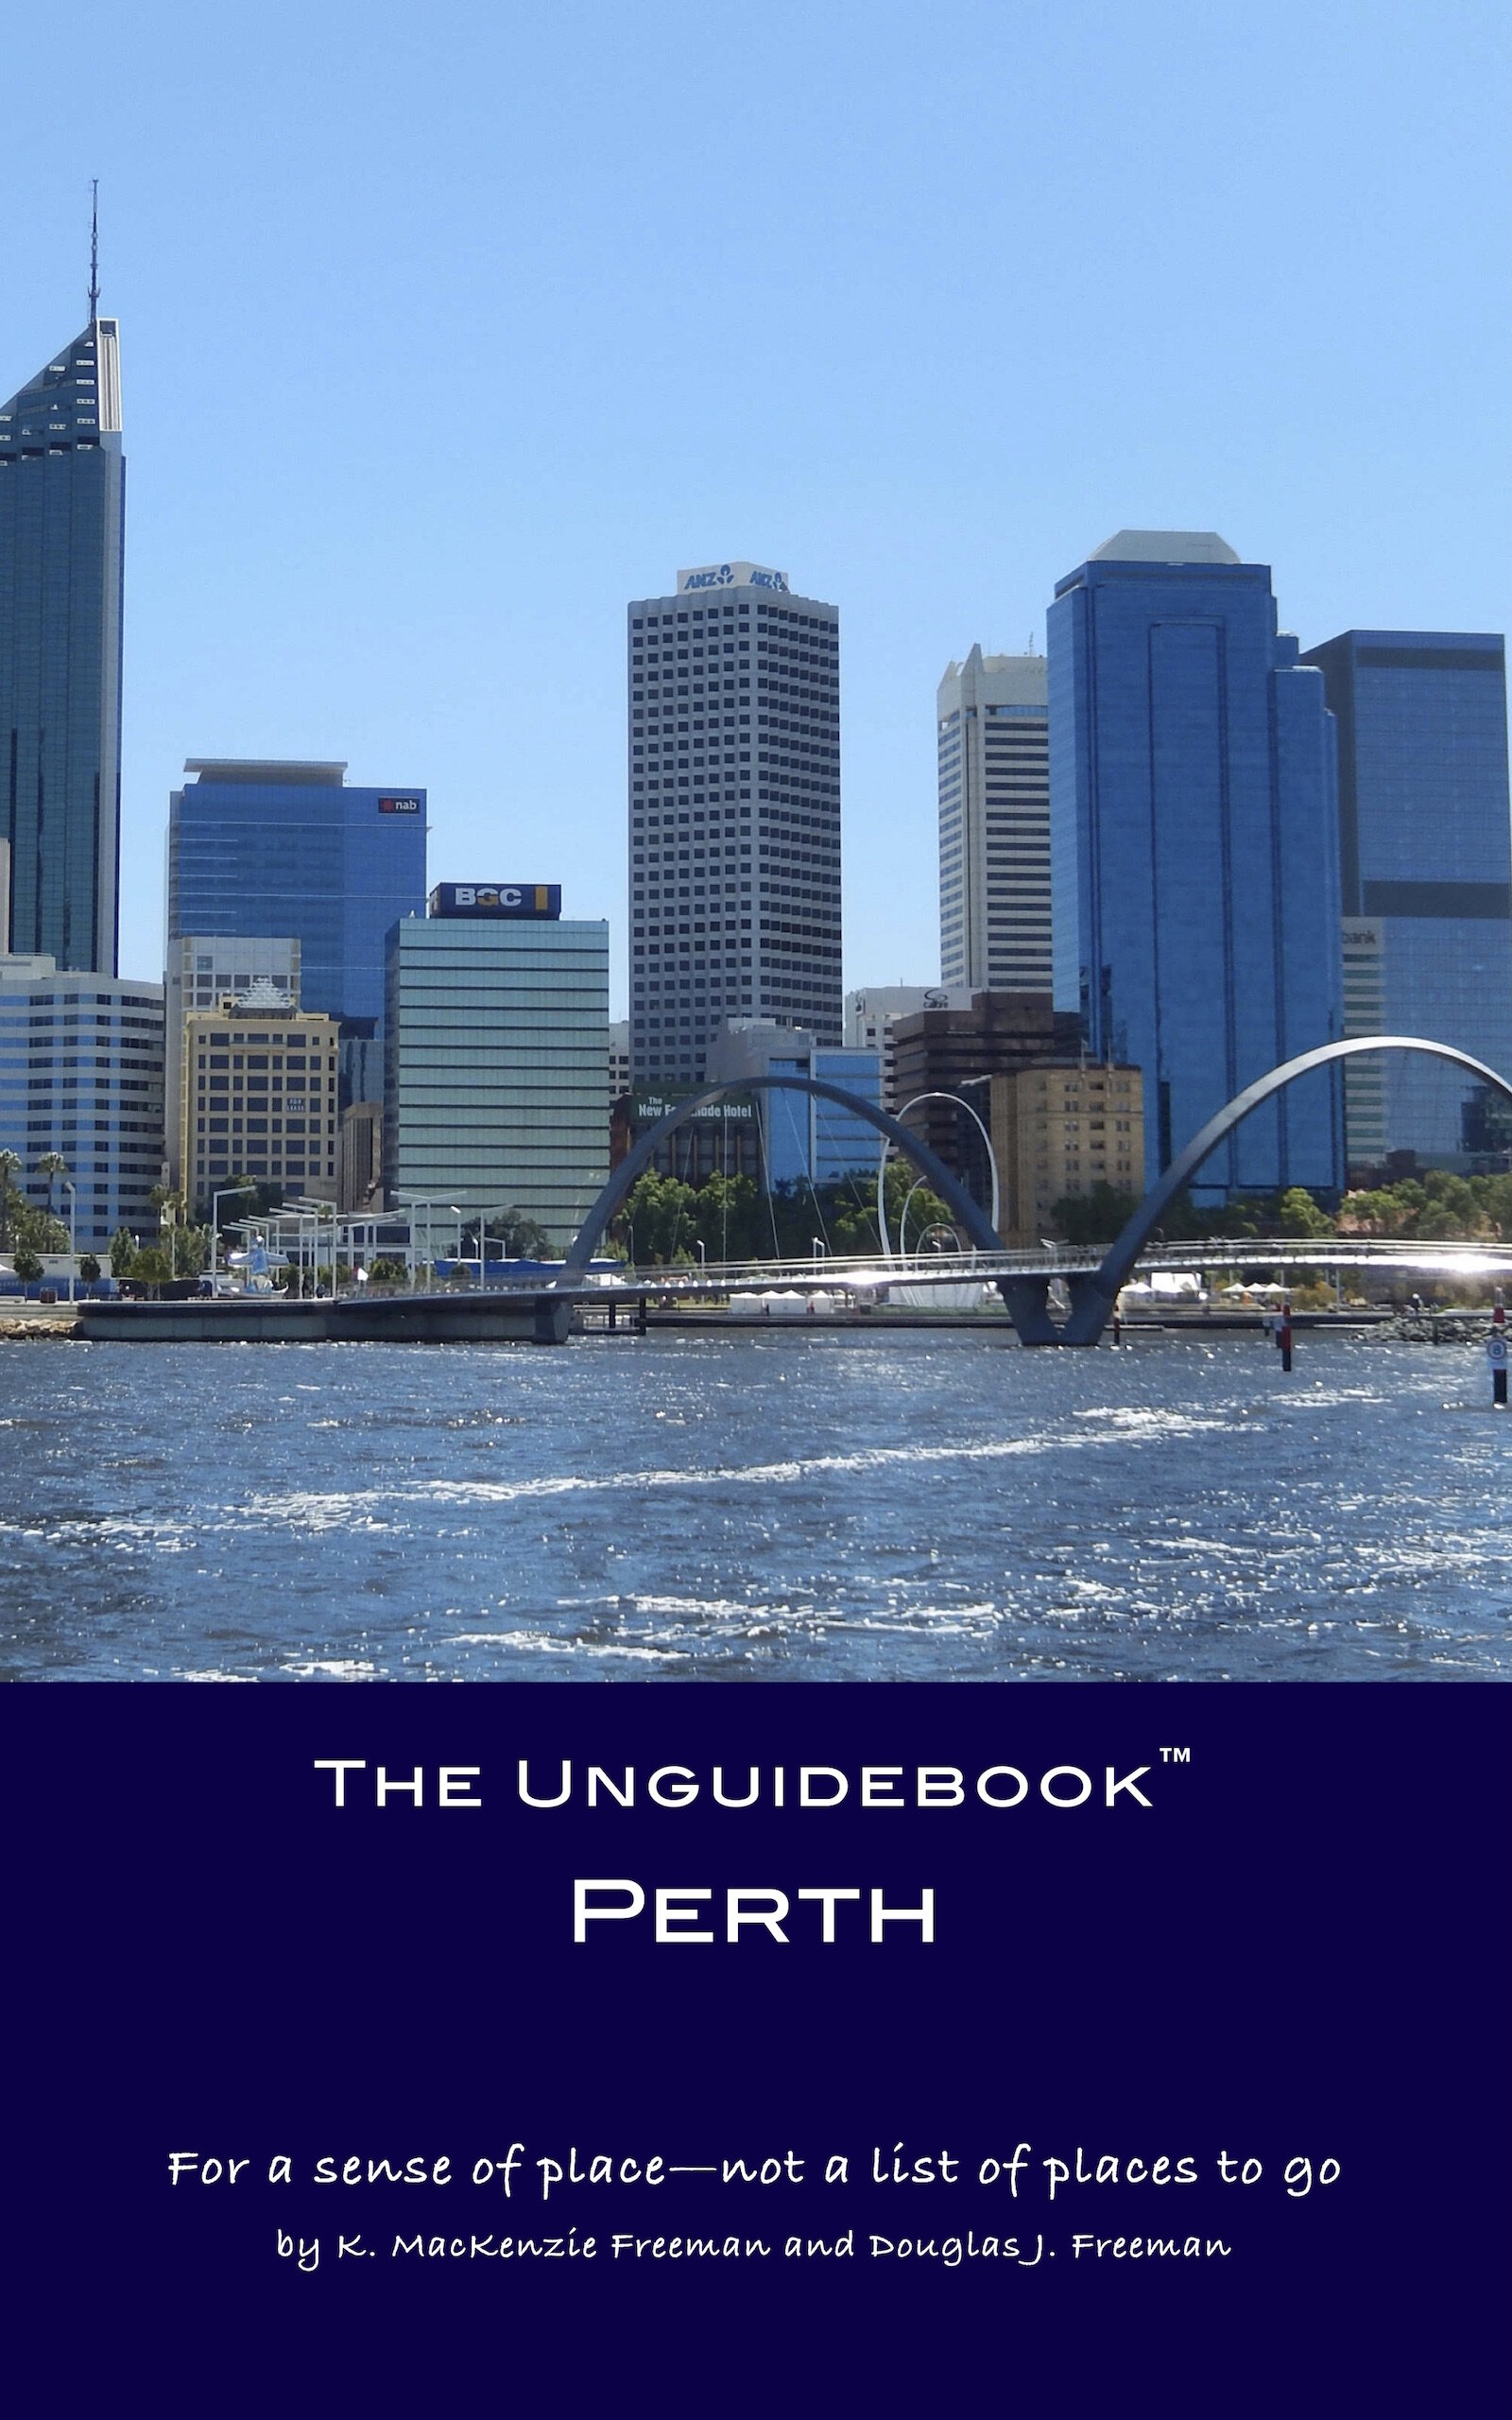 Perth ebk 091619o.jpg